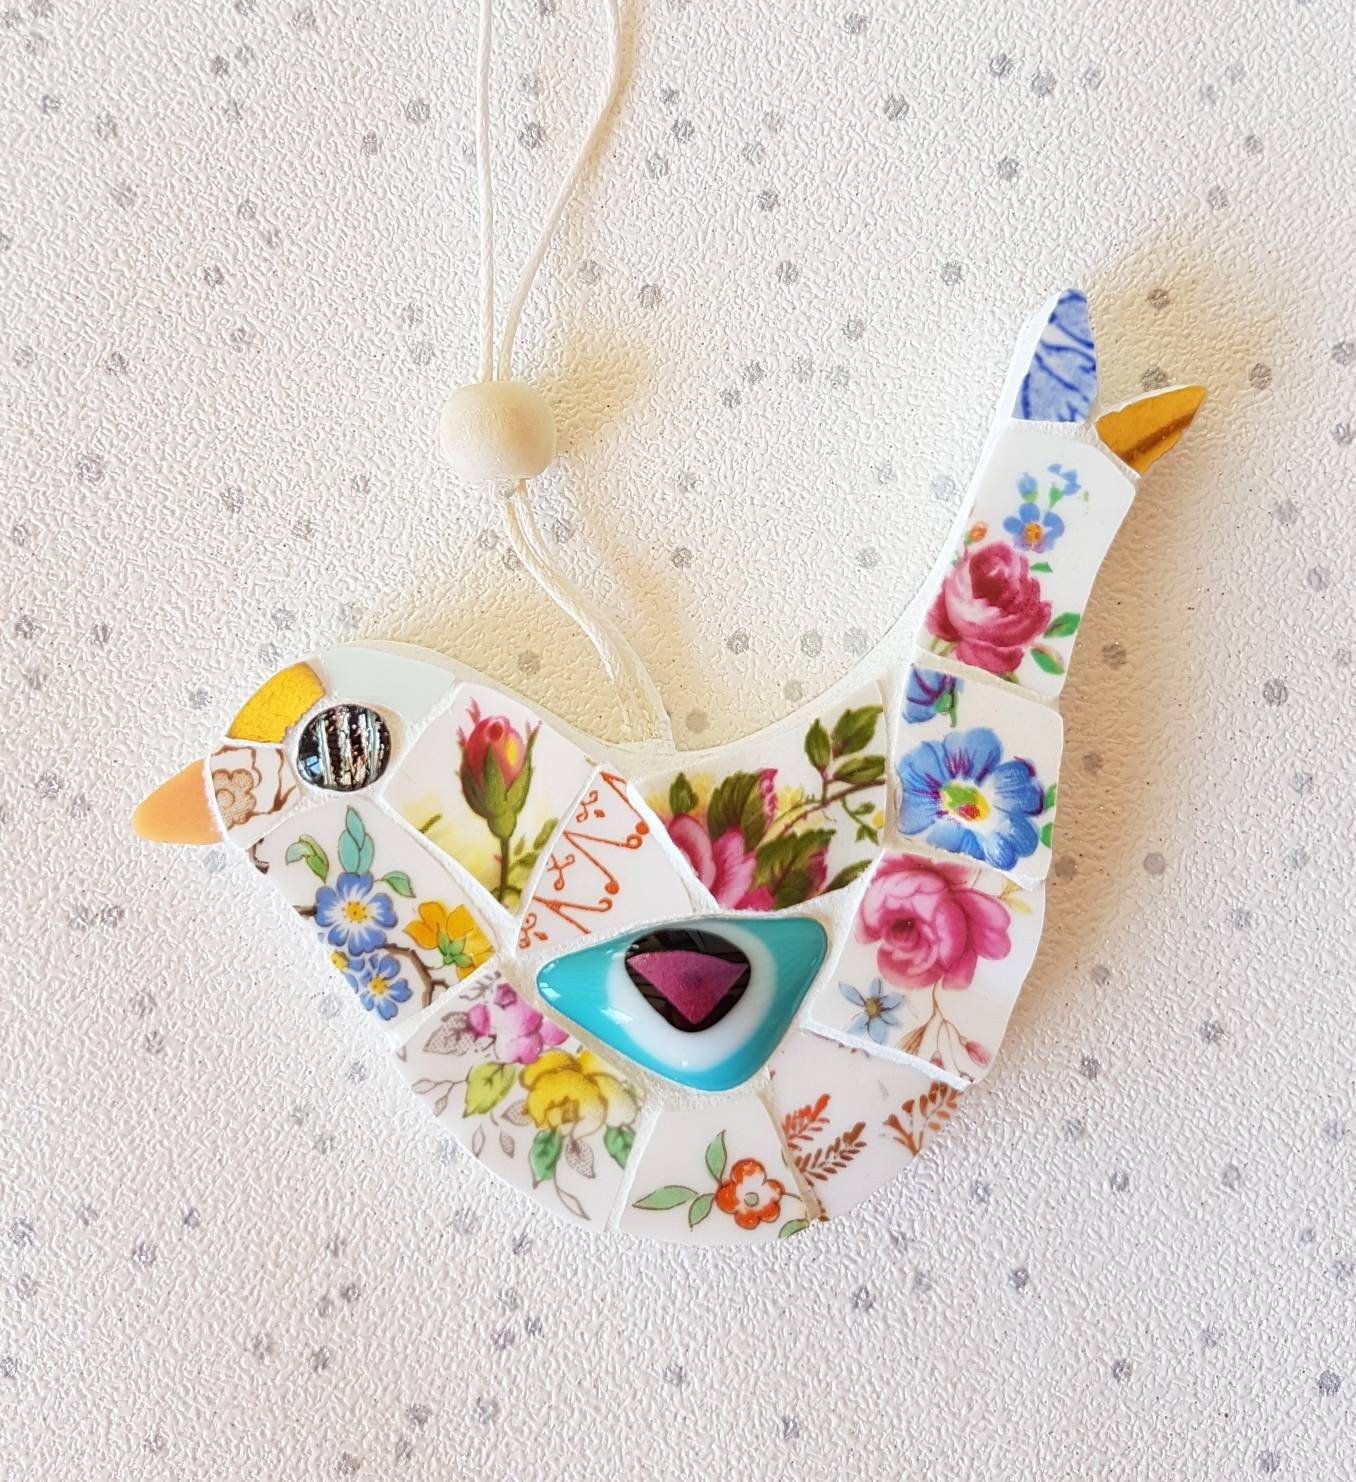 Vintage China Dove Mosaic Bird Art Hanging Garden